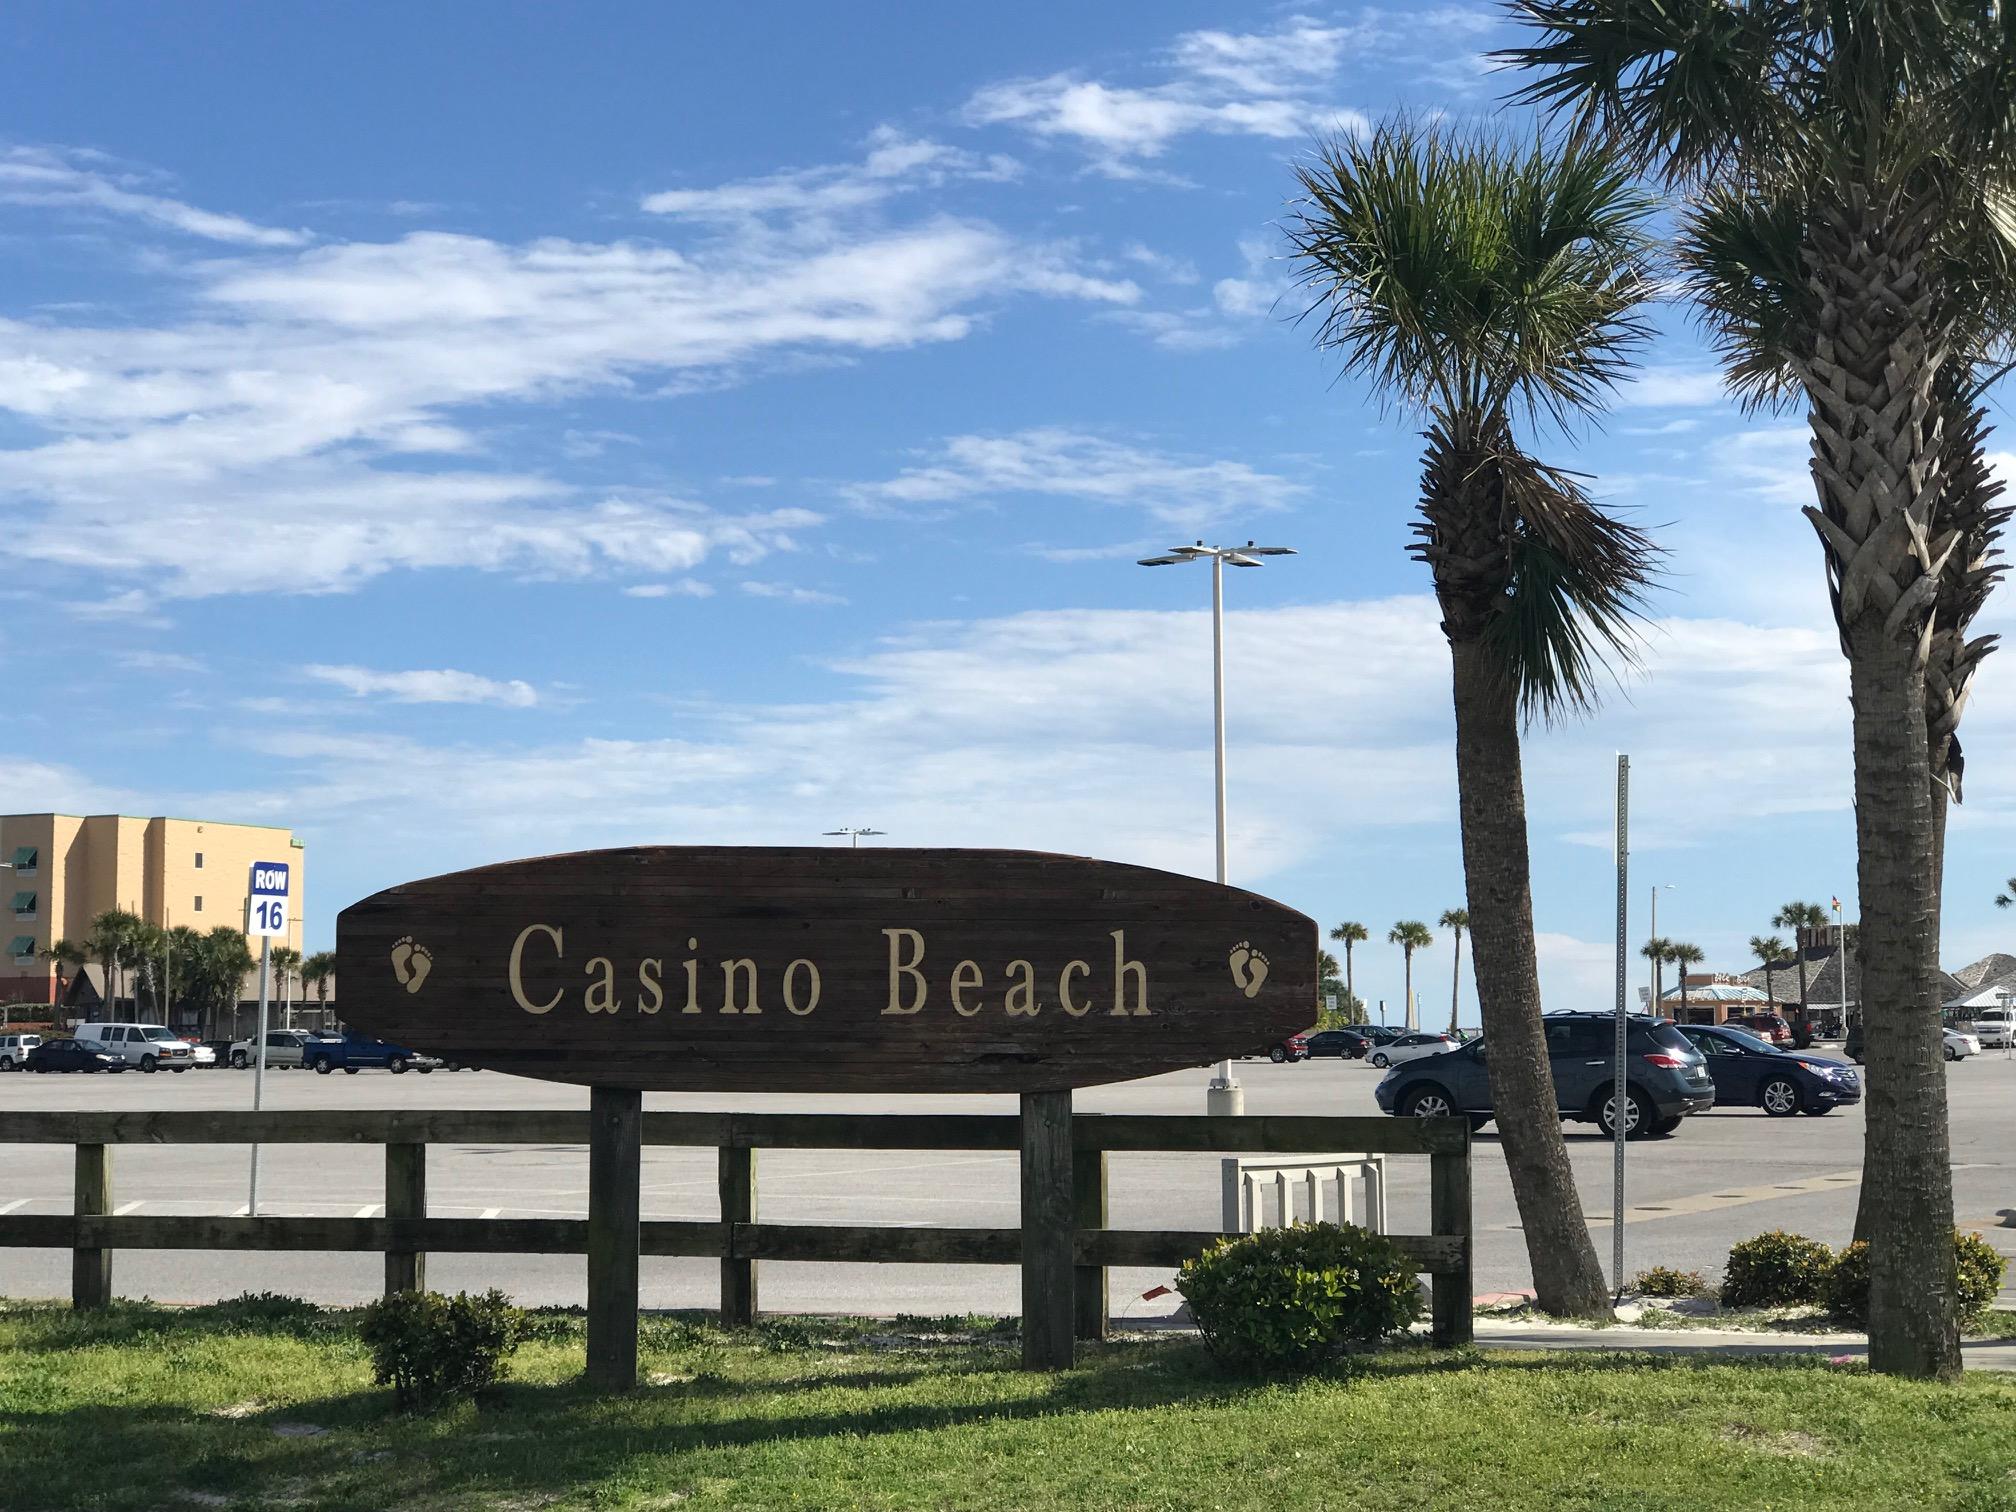 Emerald Isle #1105 Condo rental in Emerald Isle Pensacola Beach in Pensacola Beach Florida - #40